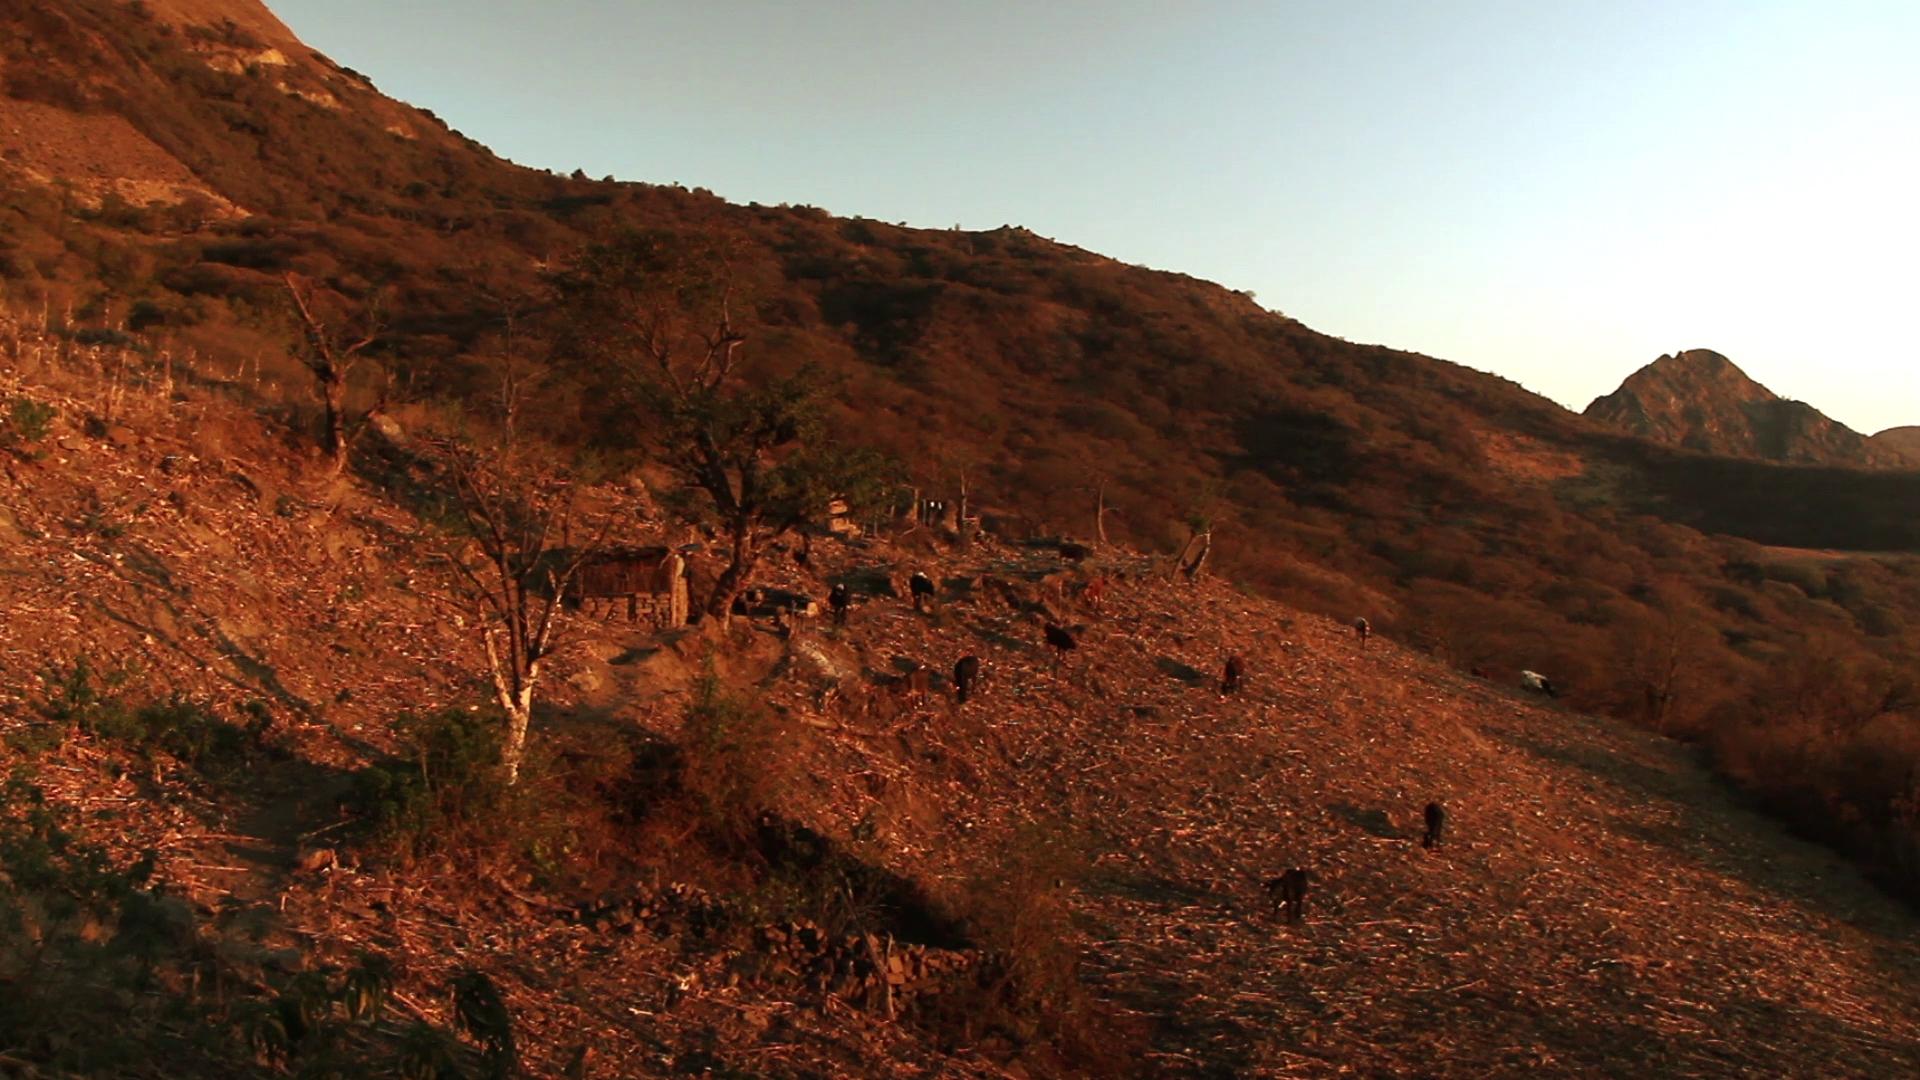 paisaje la higuera pablocaminante - Ruta del Che 2/2, La Higuera